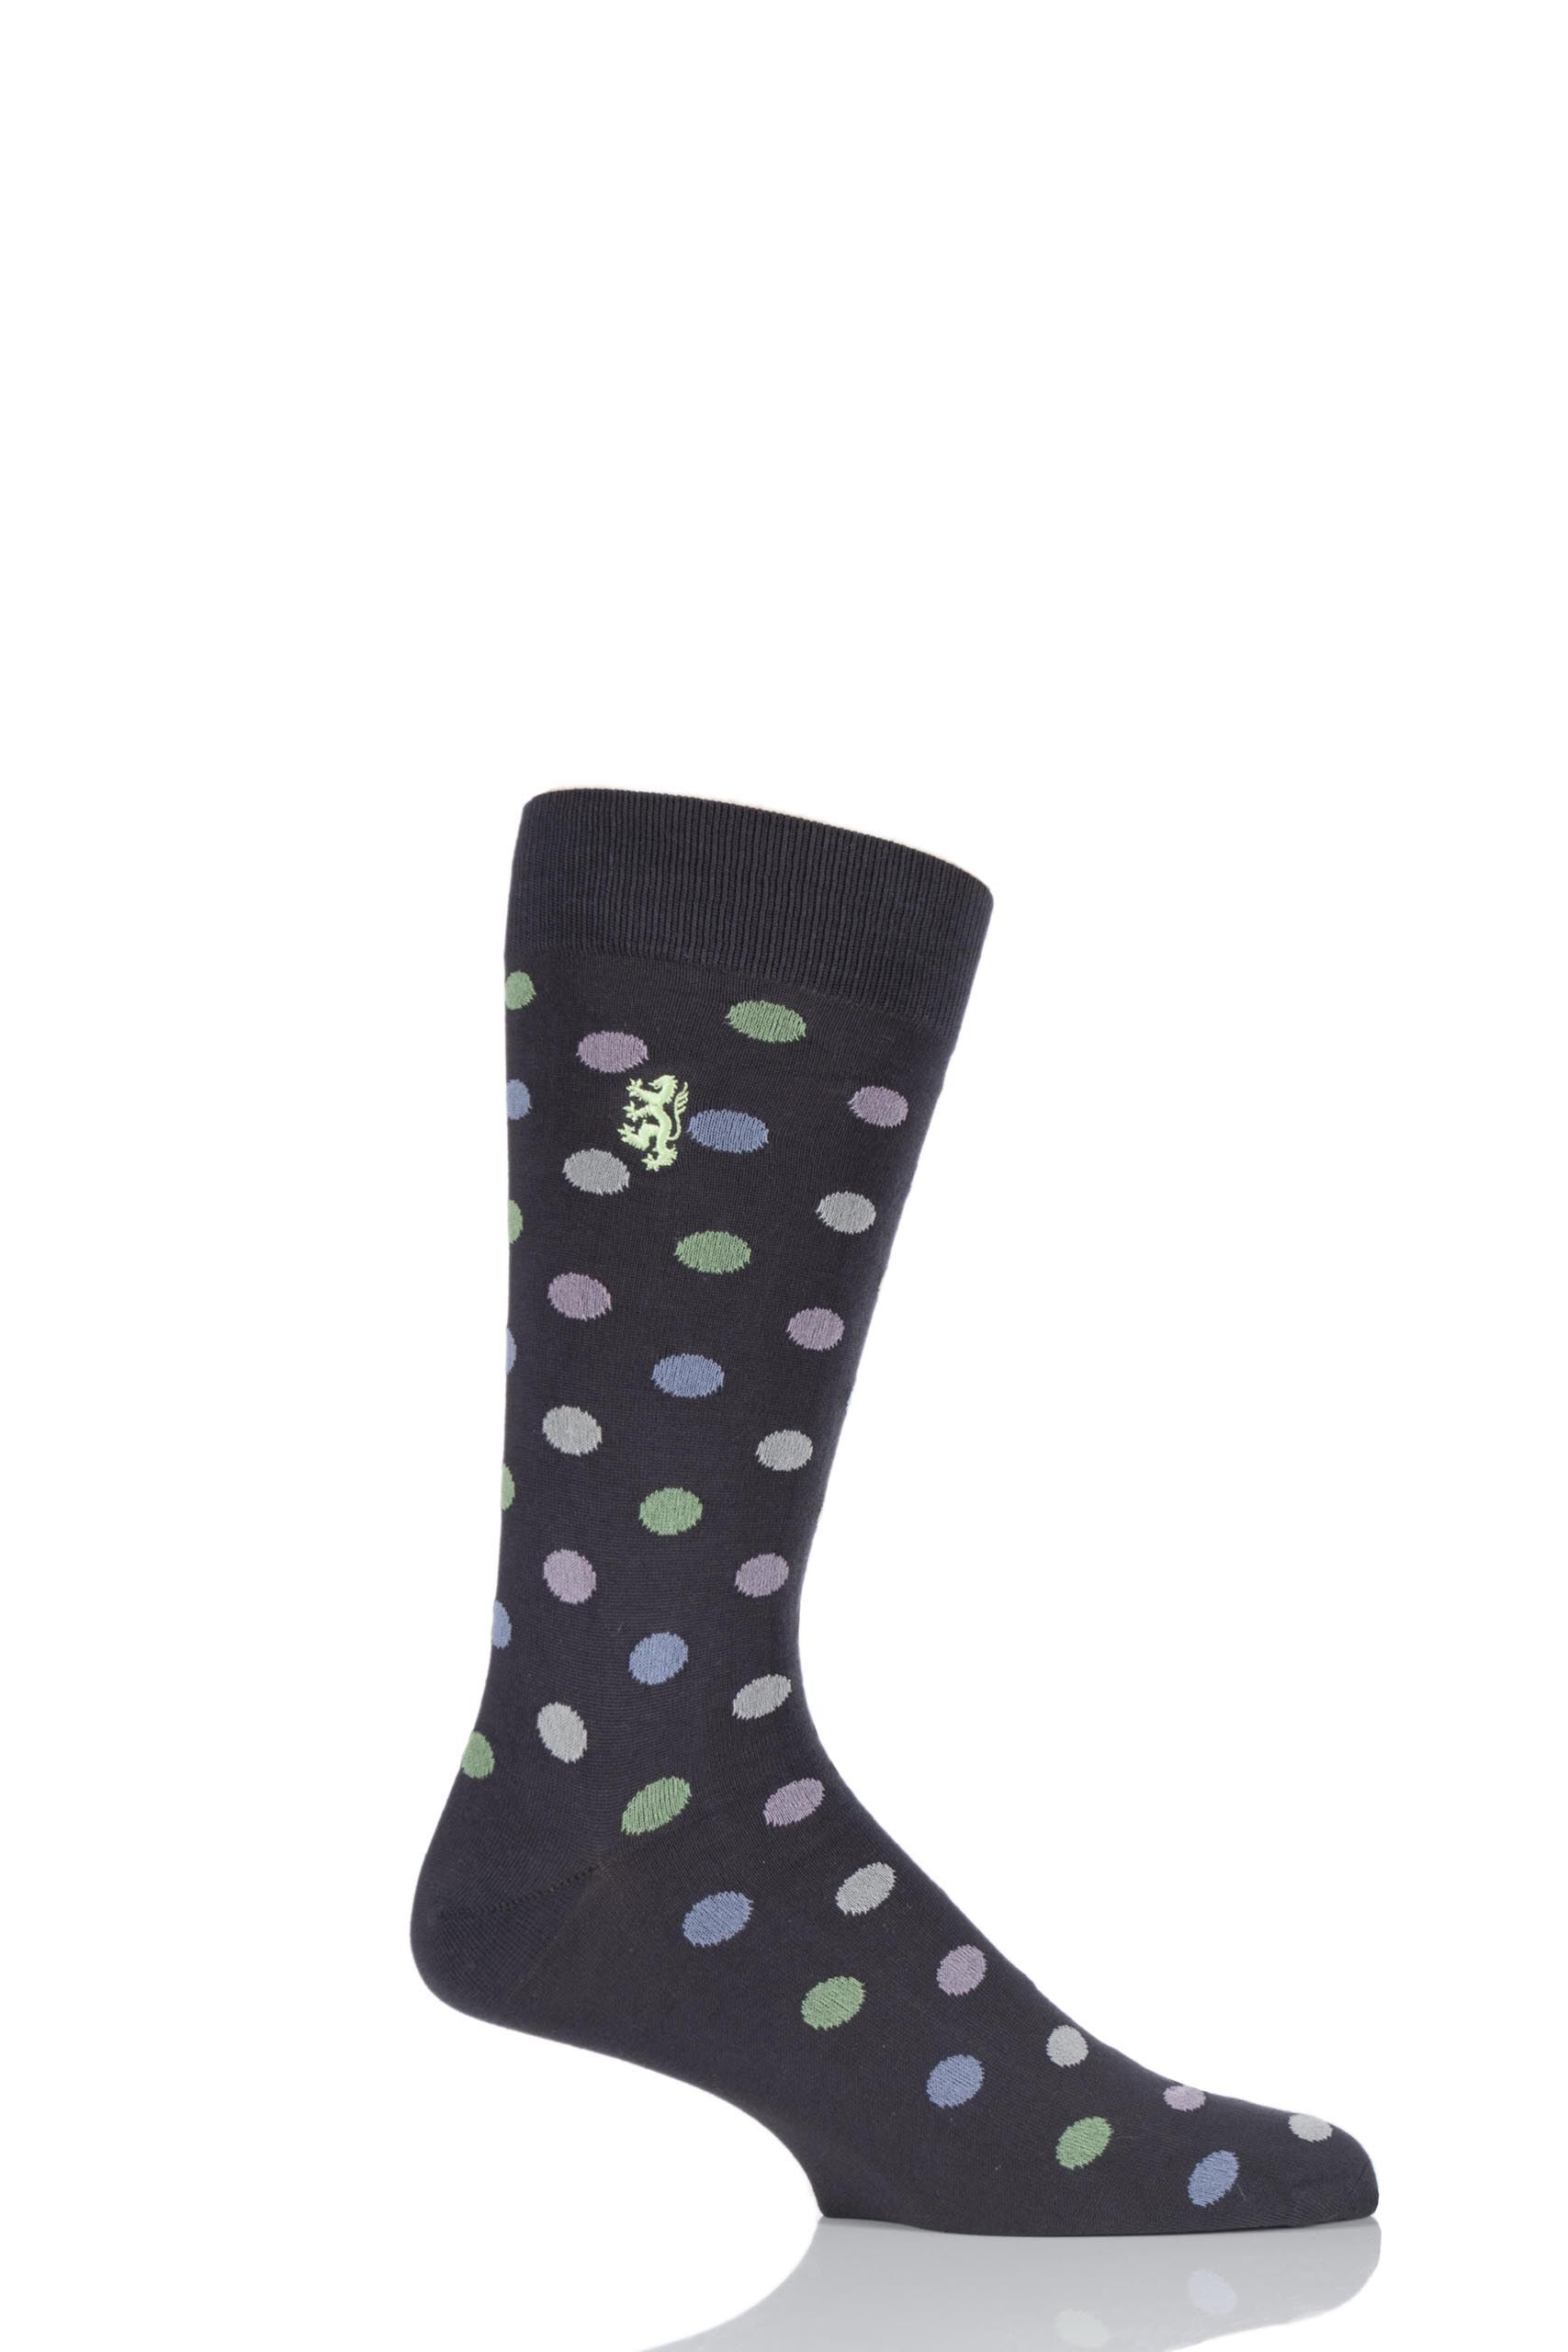 Image of 1 Pair Charcoal 80% Sea Island Cotton Spots Socks Men's 6-8.5 Mens - Pringle of Scotland